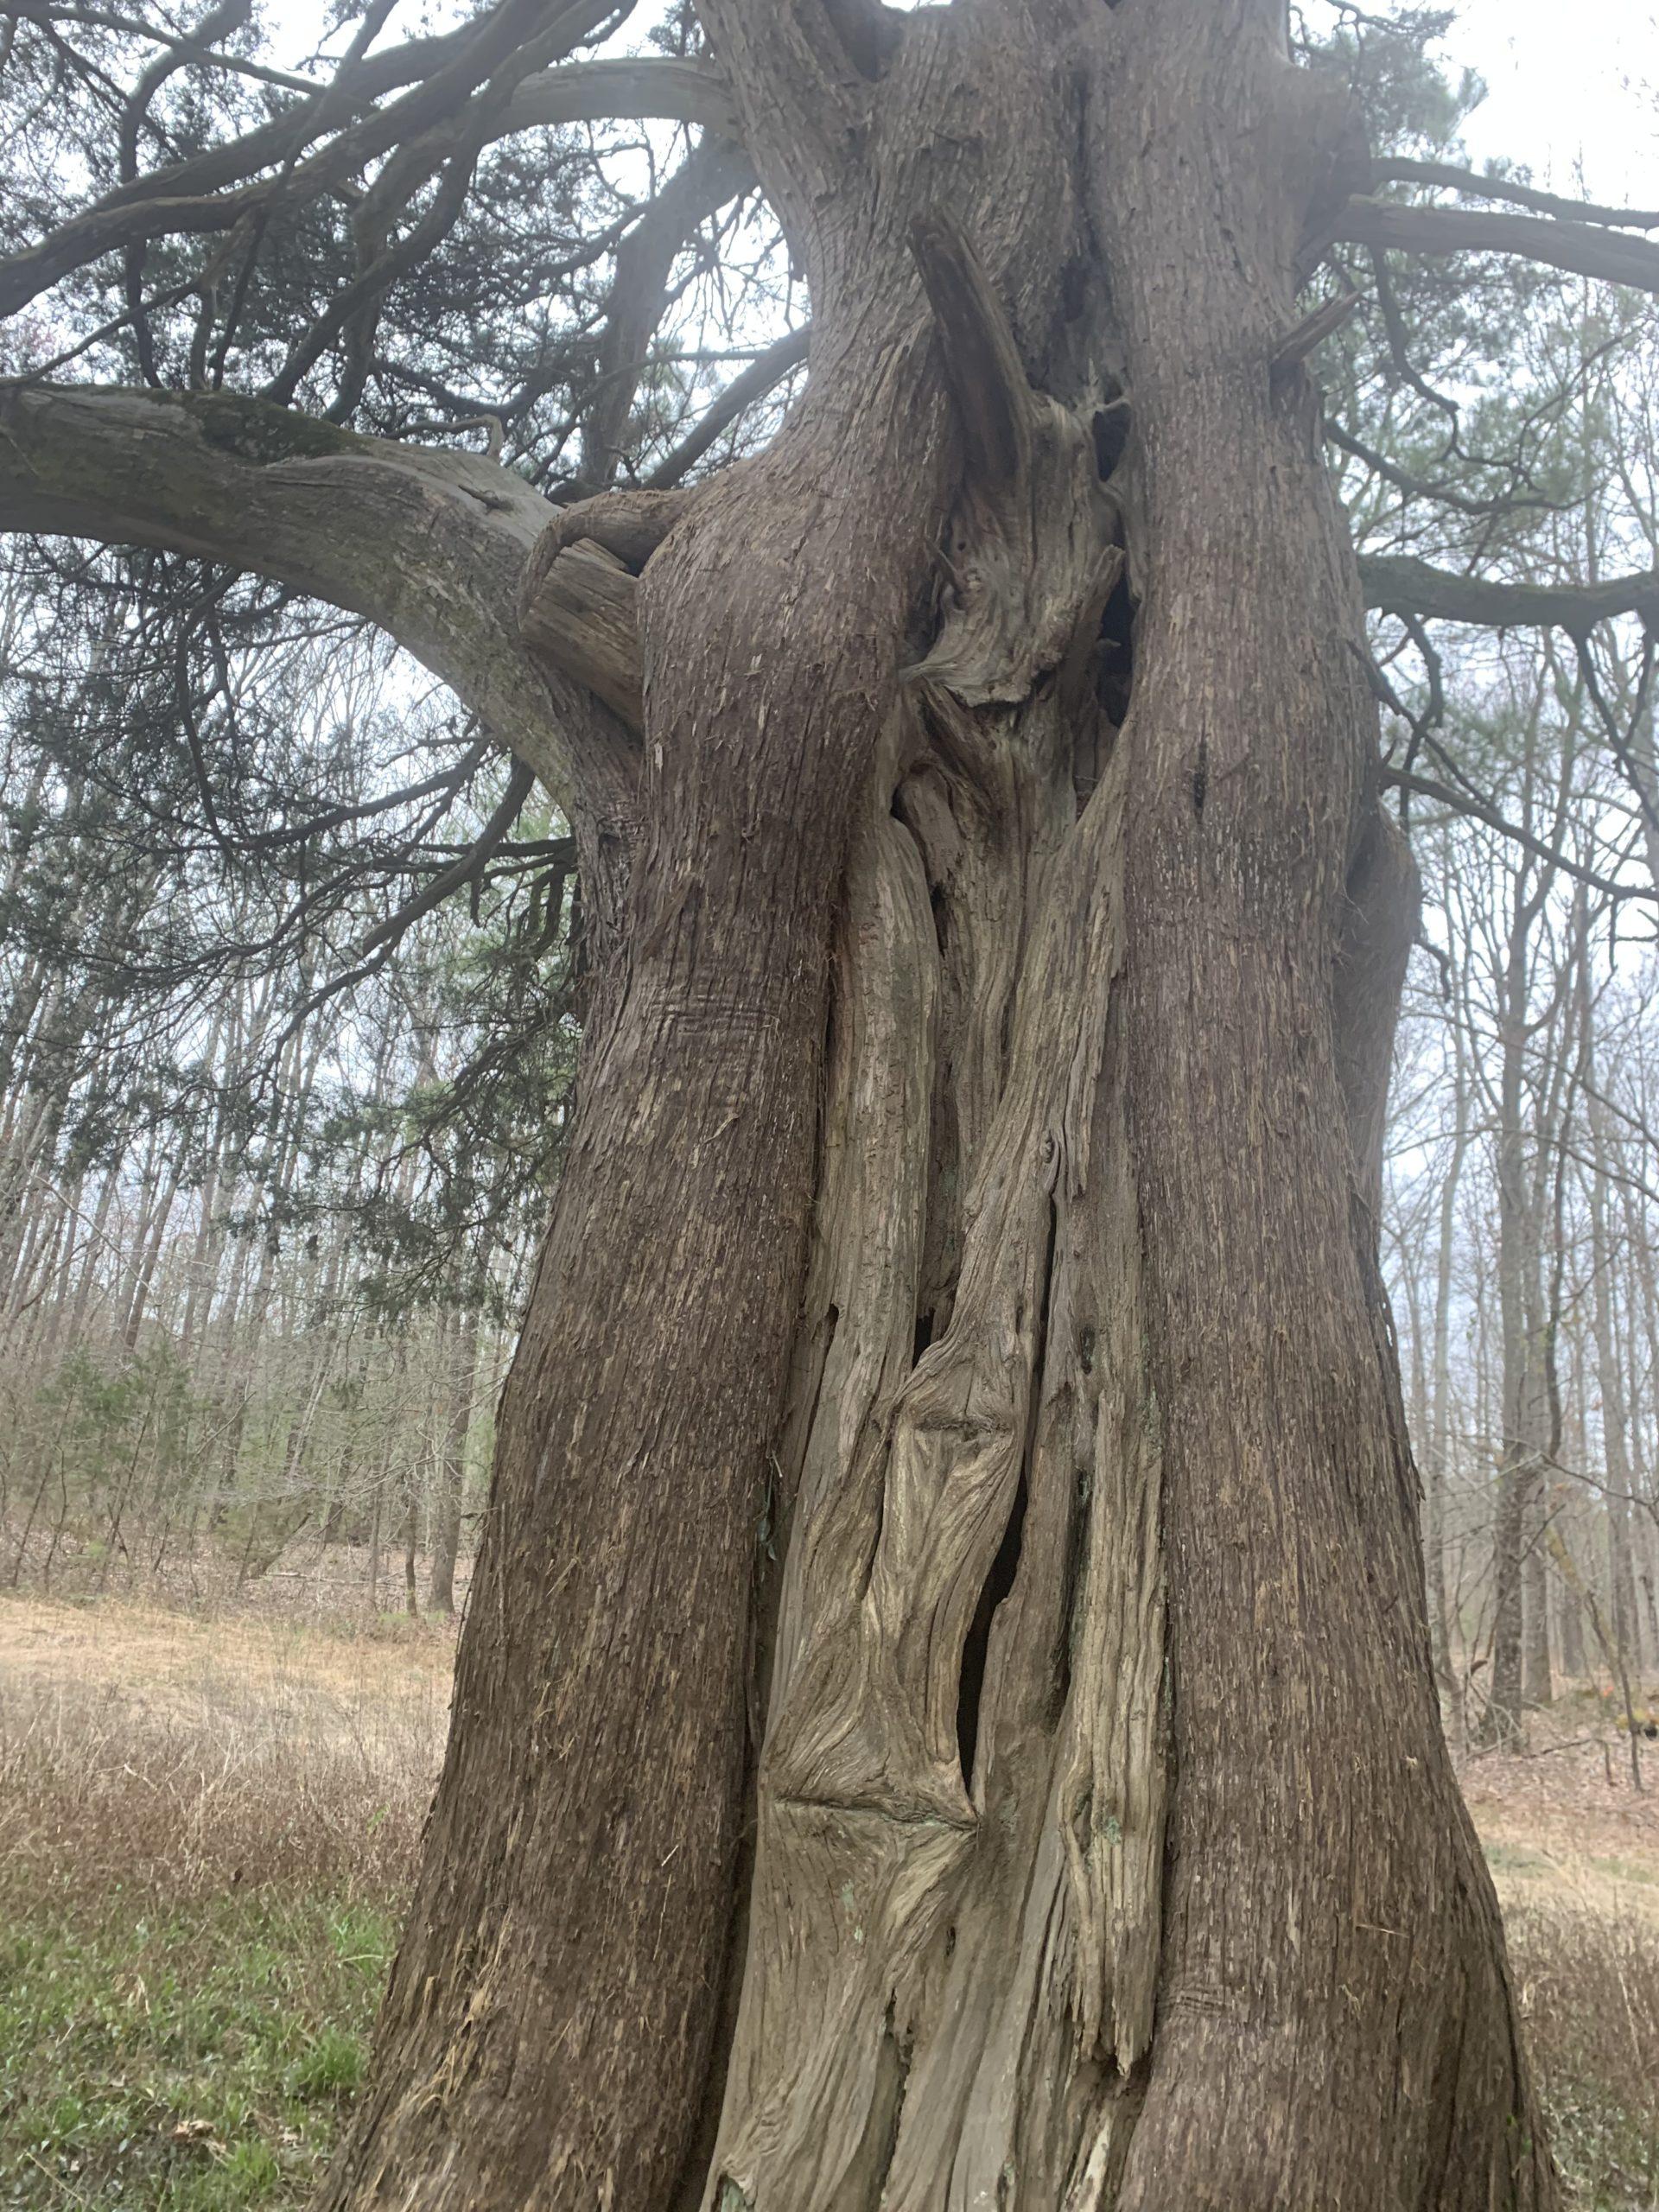 The Remarkable Cedars of Historic Tuckahoe